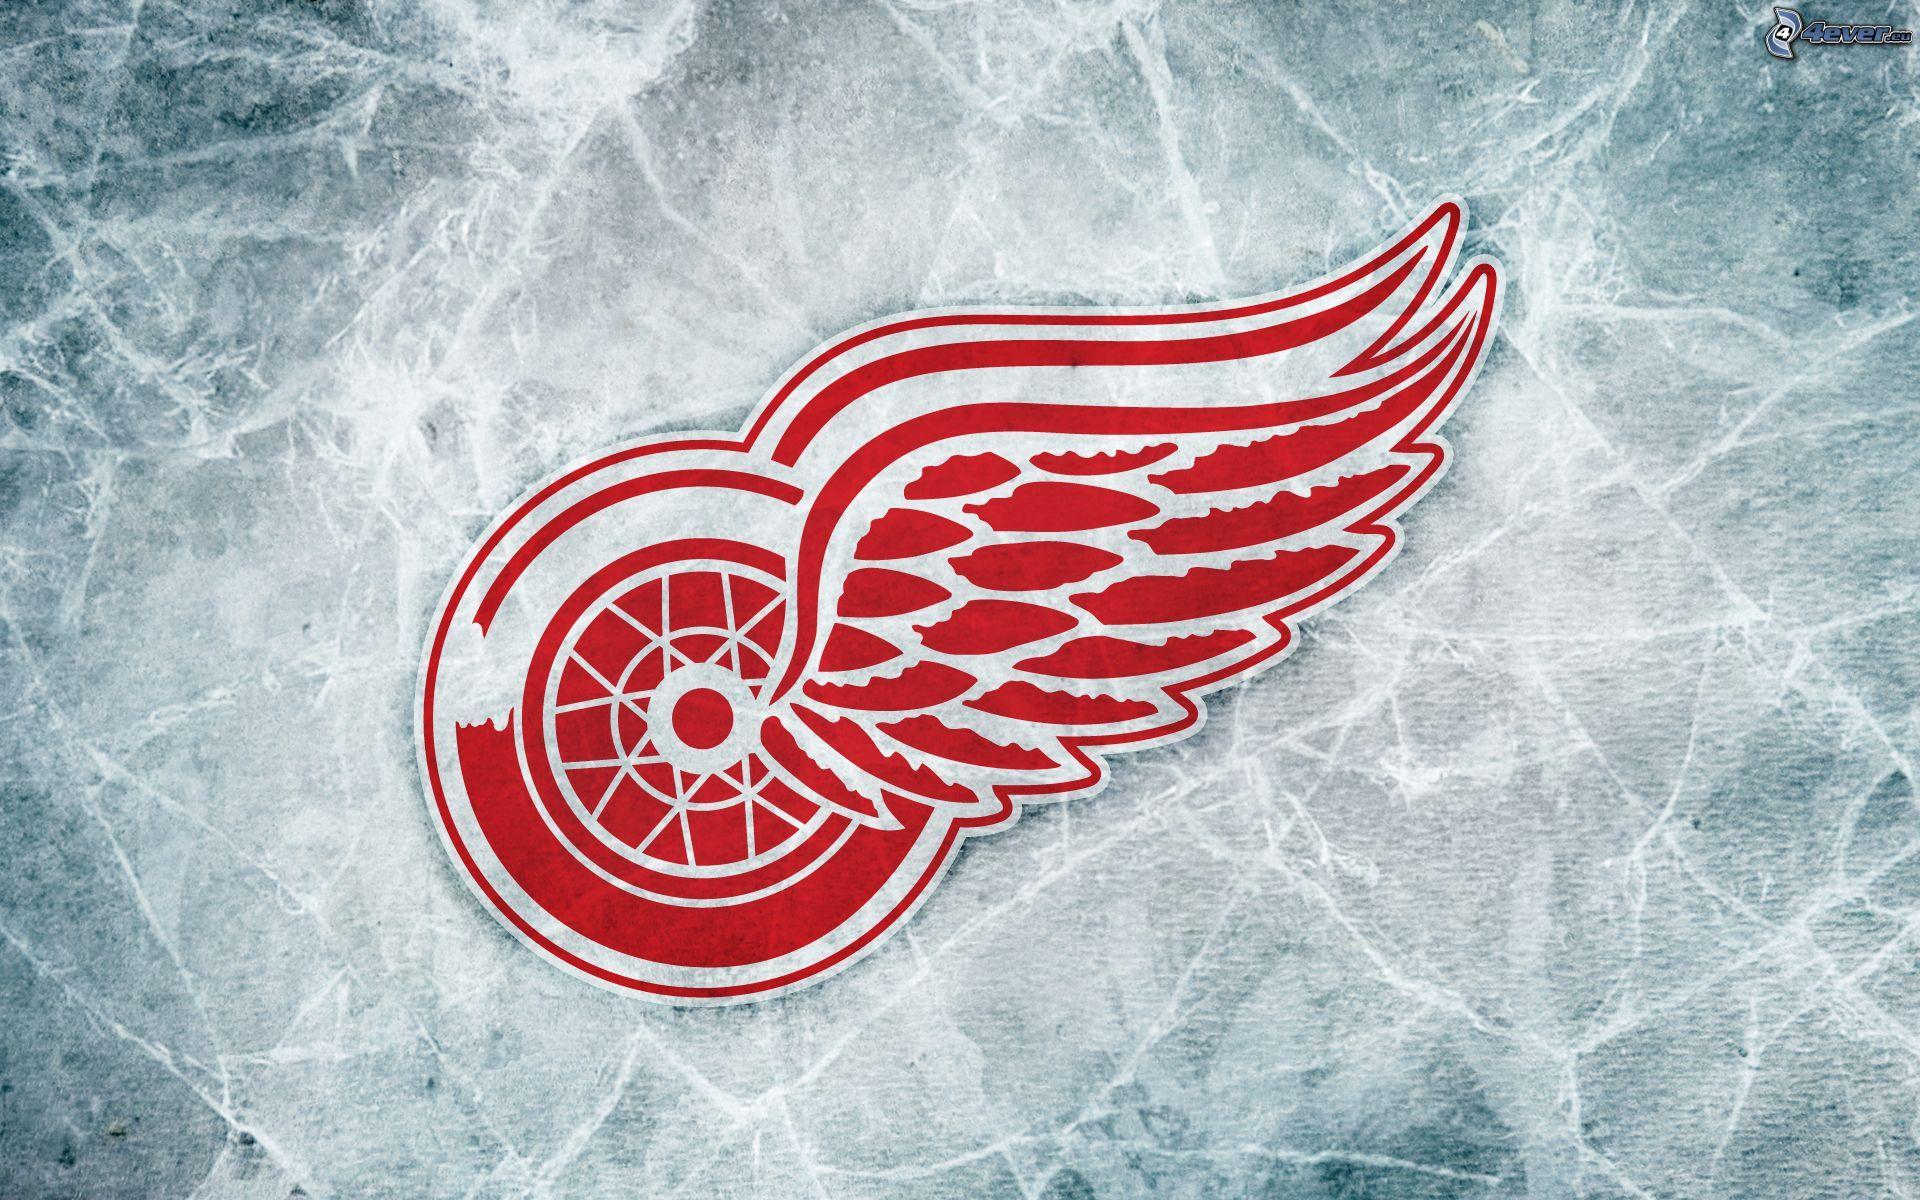 Detroit Red Wings Nhl